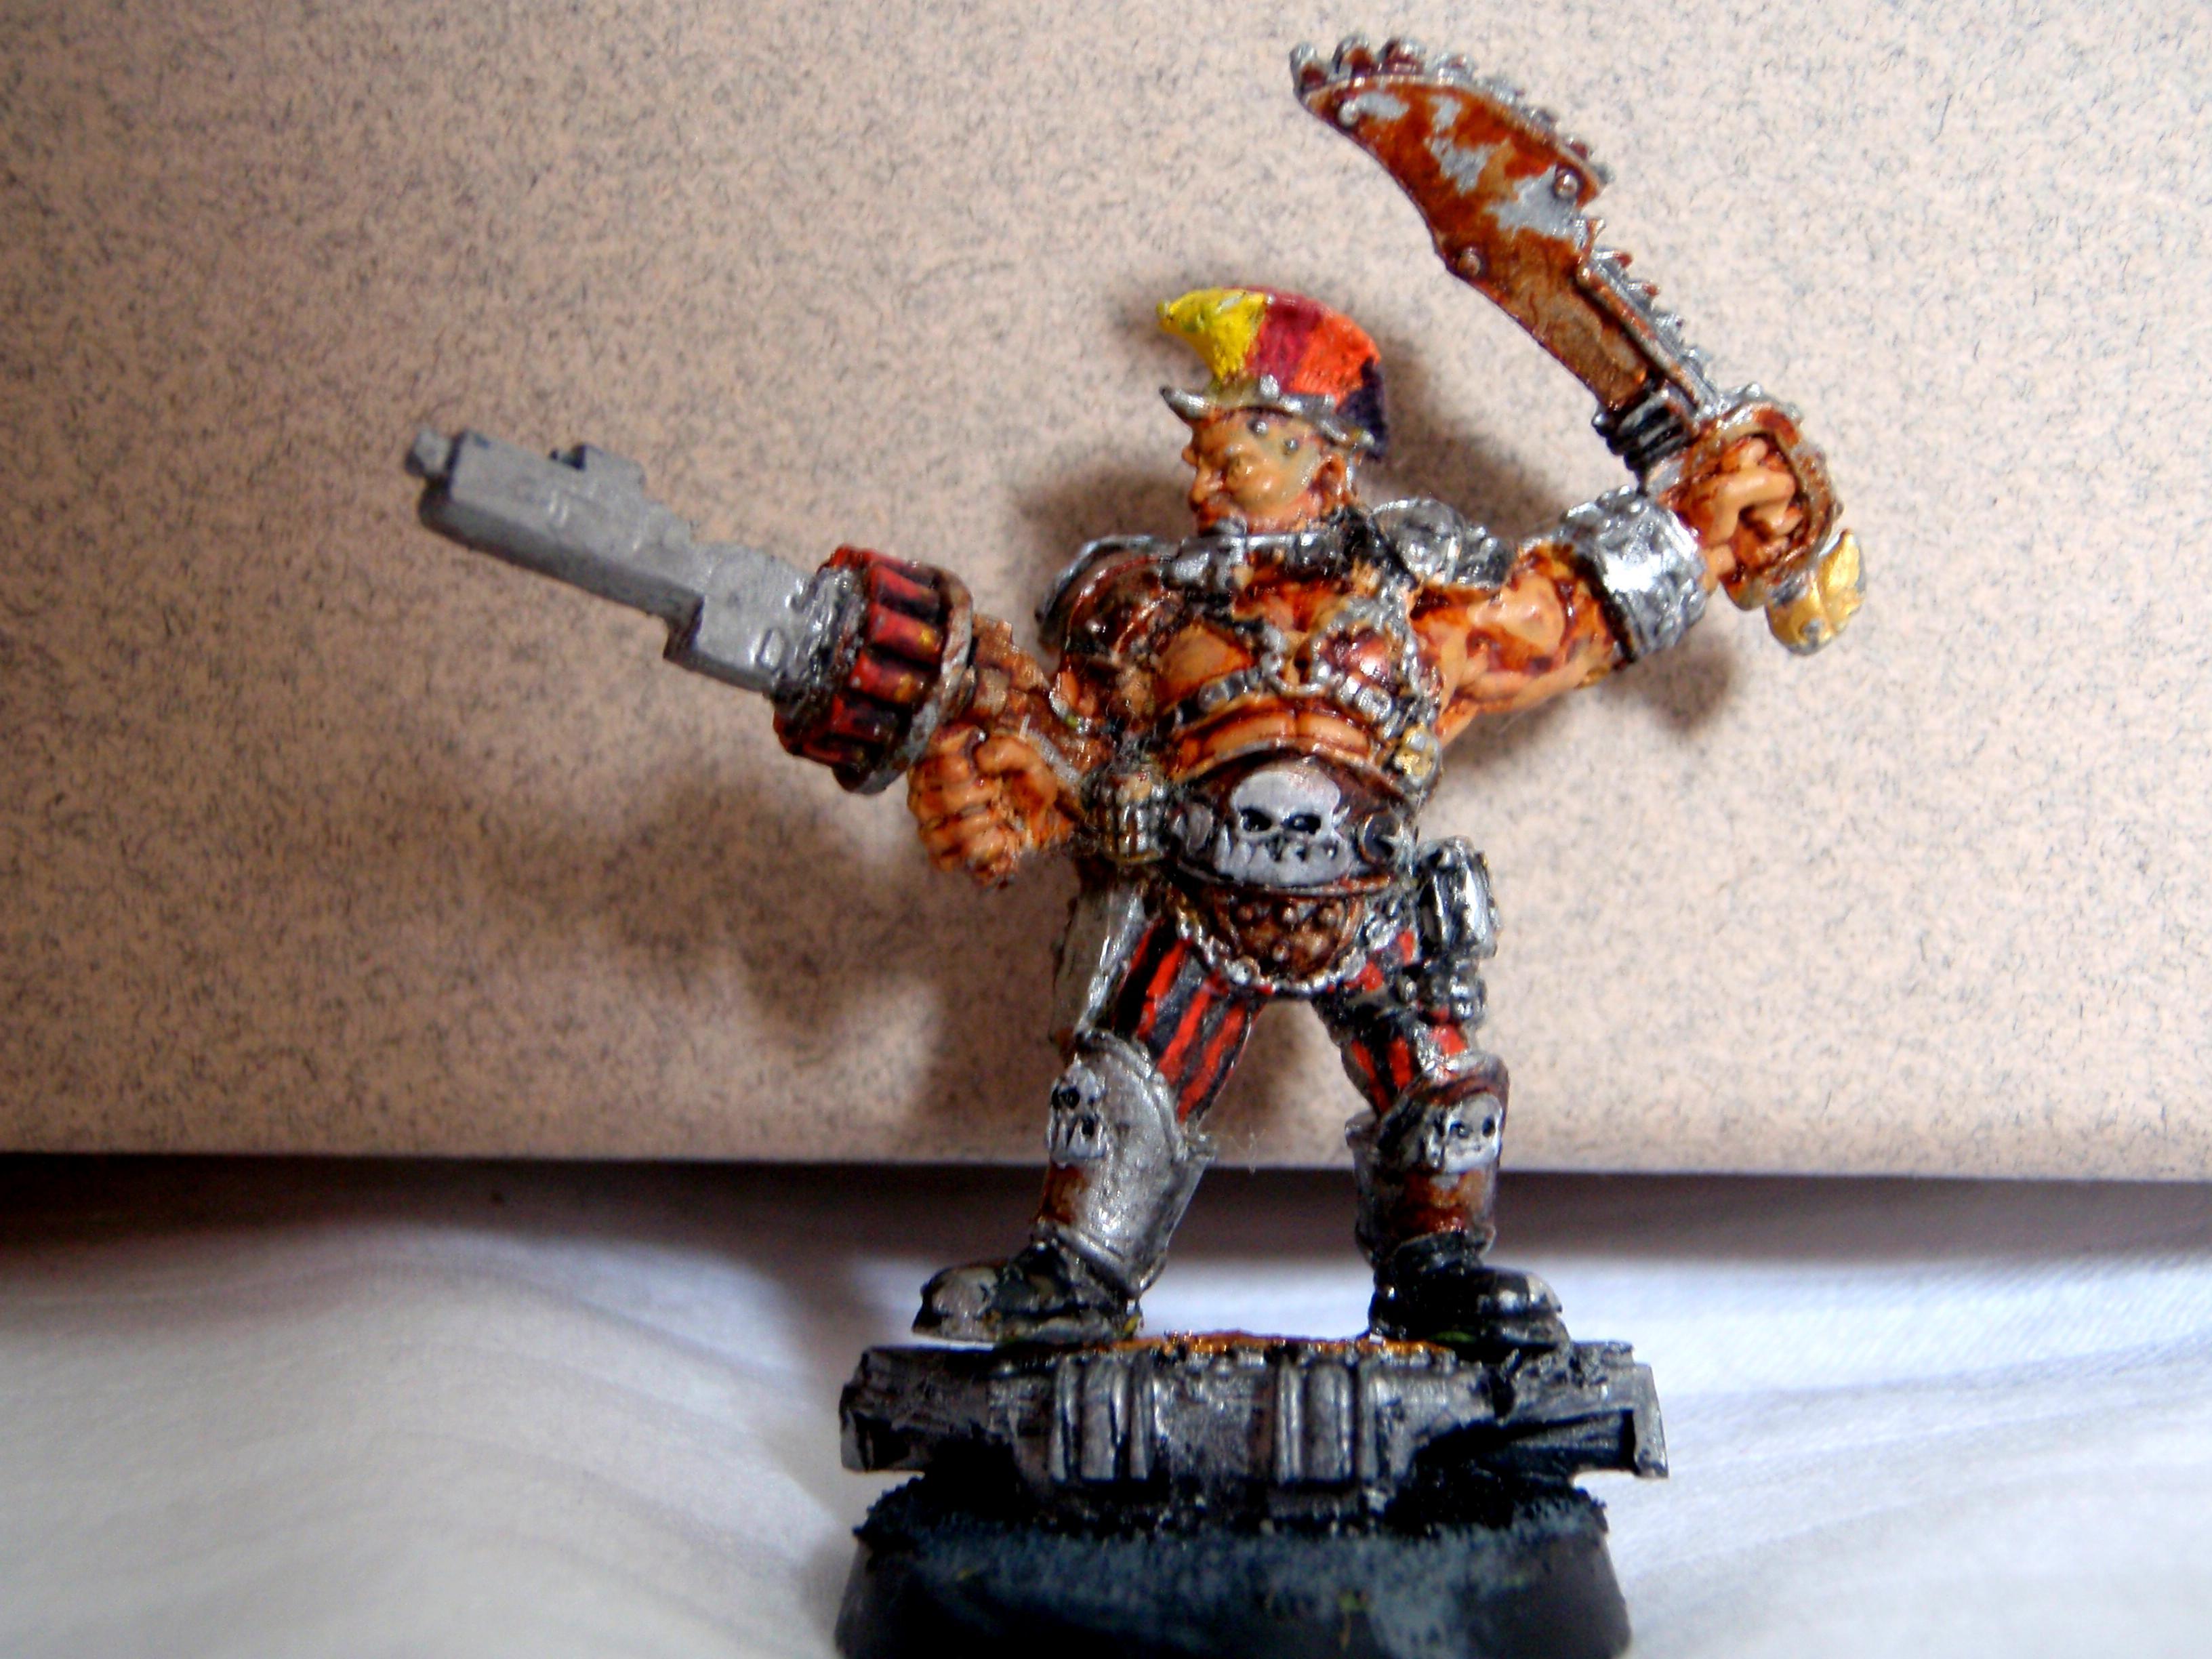 Goliath